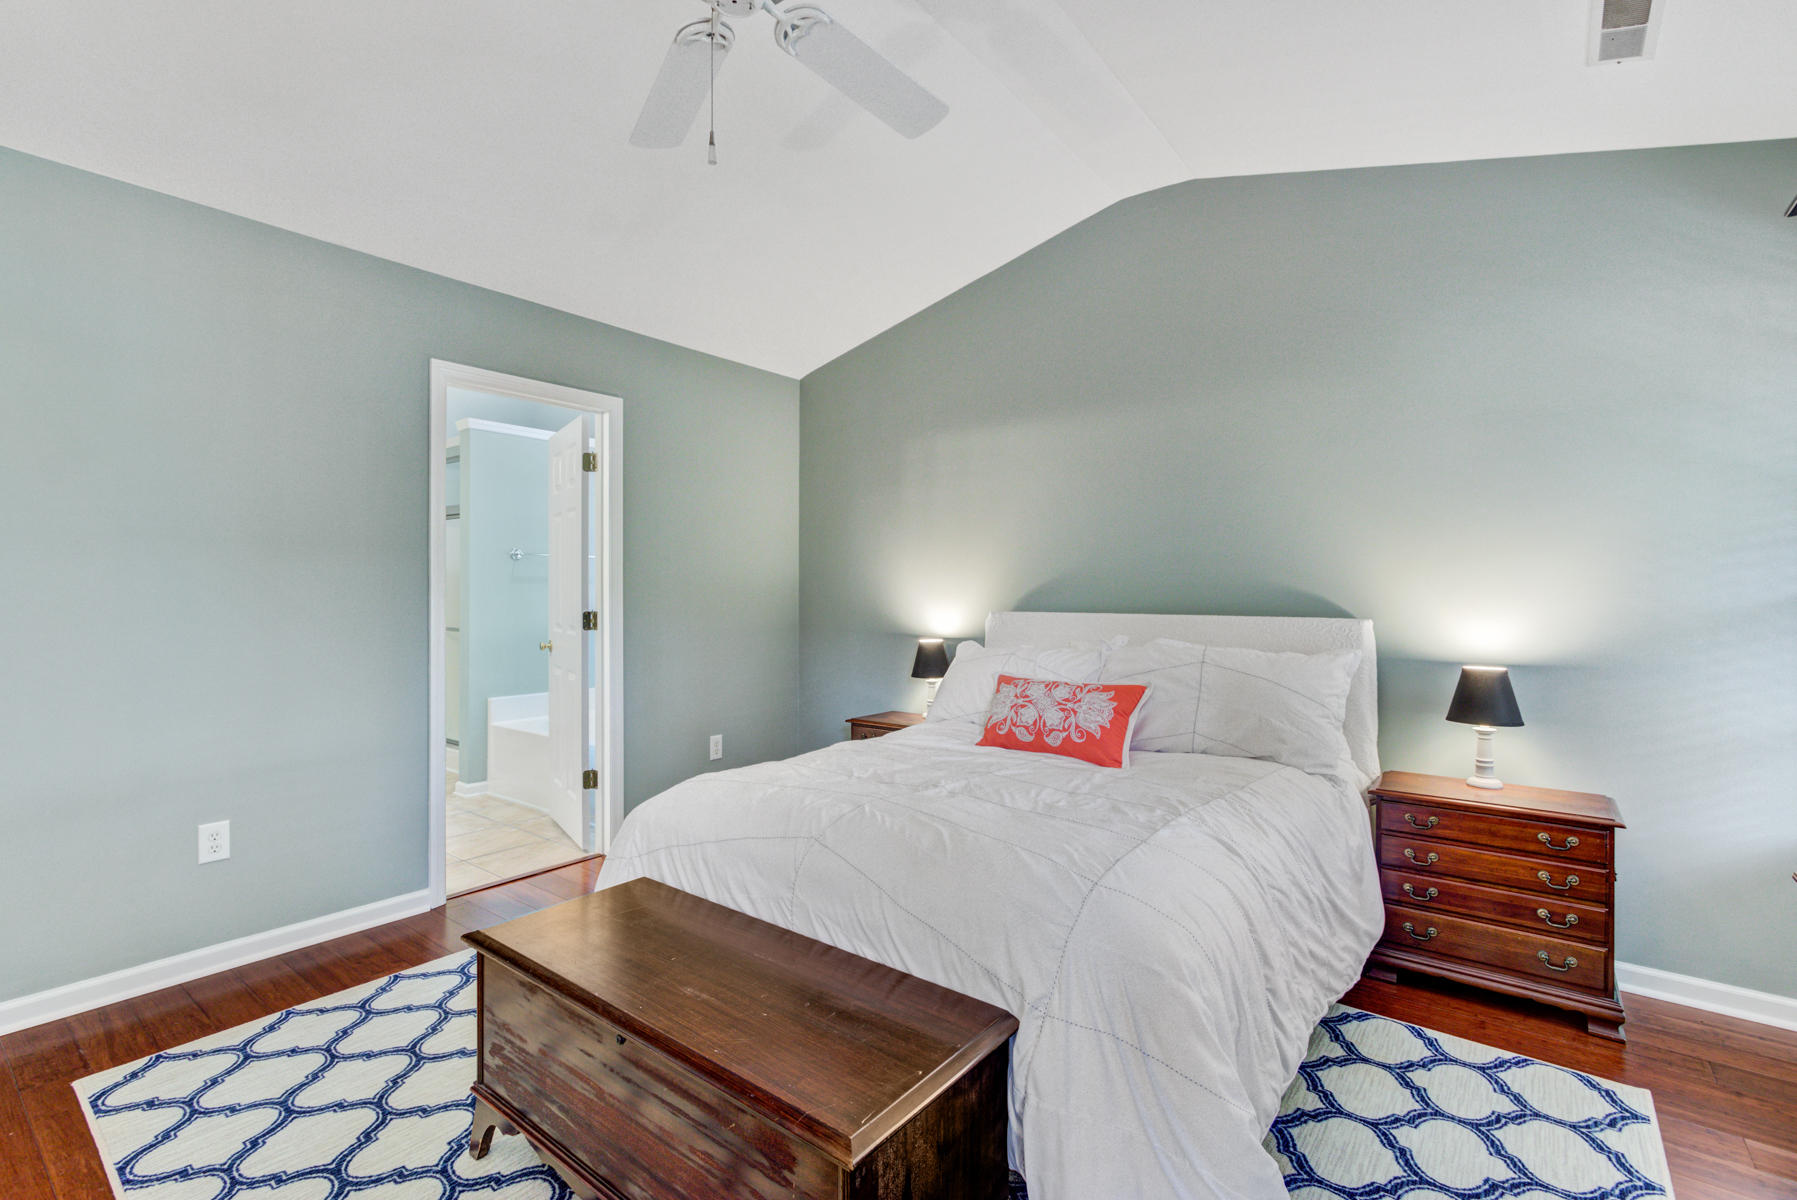 Park West Homes For Sale - 3444 Wellesley, Mount Pleasant, SC - 10